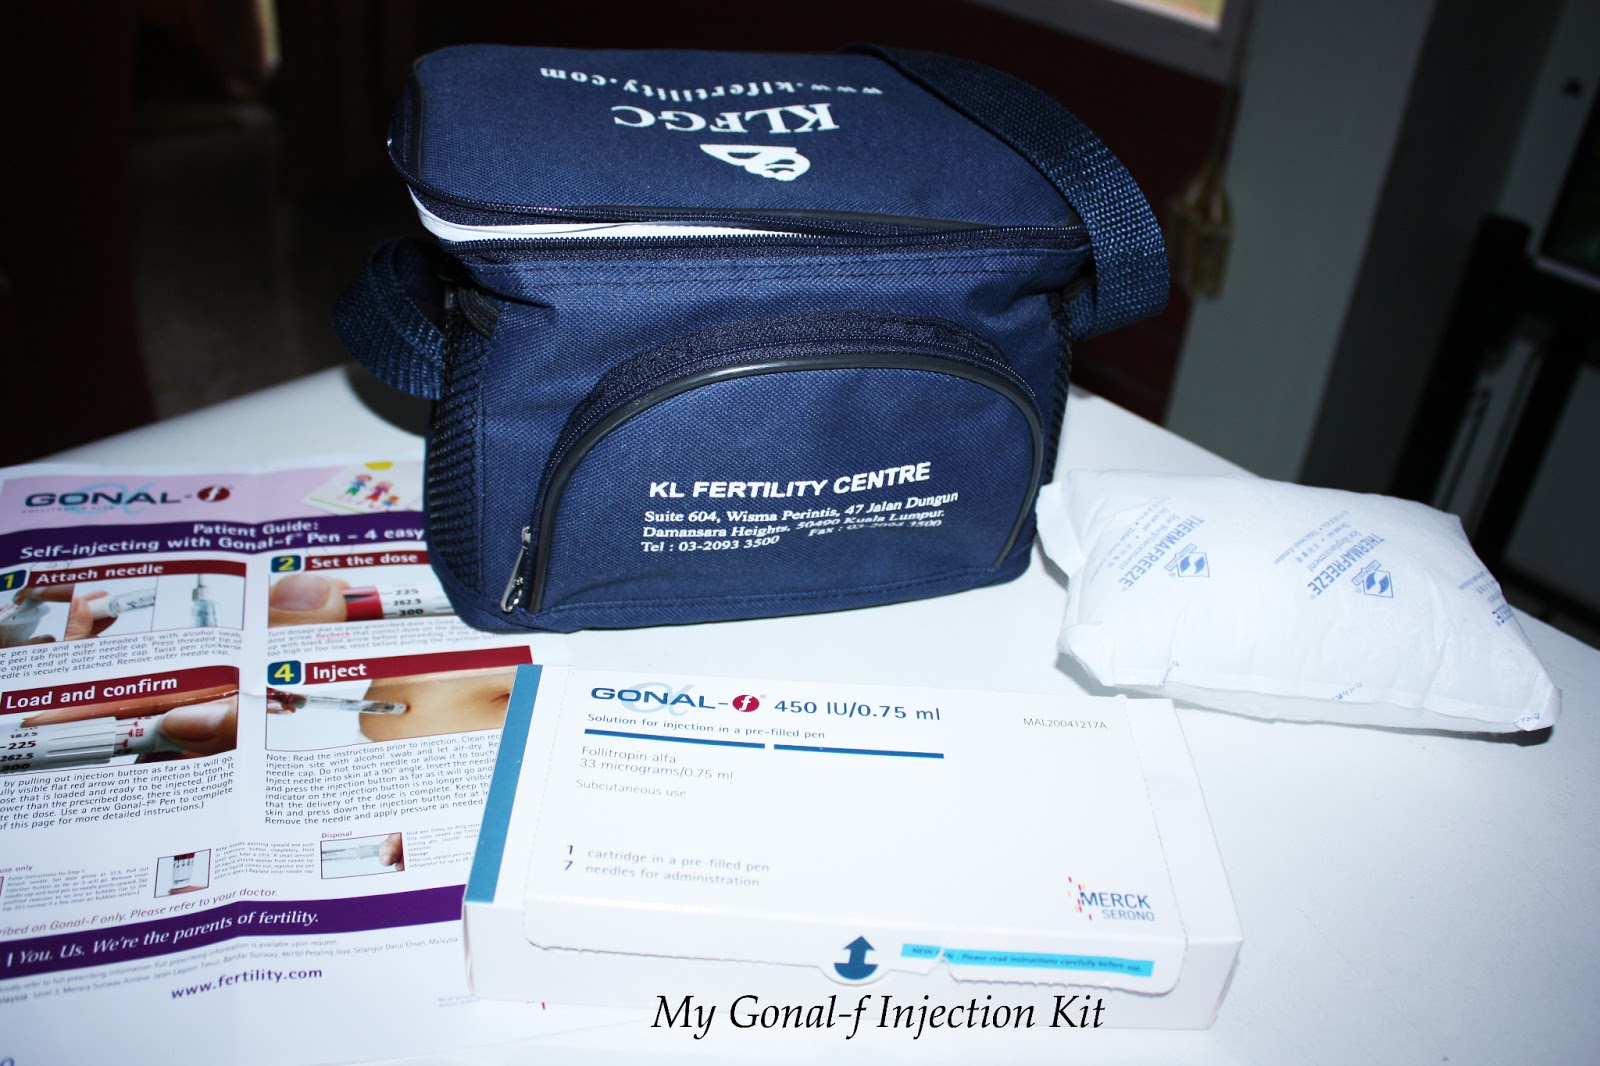 Wishing For A Sunshine: IUI Medication - KL Fertility & Gynaecology